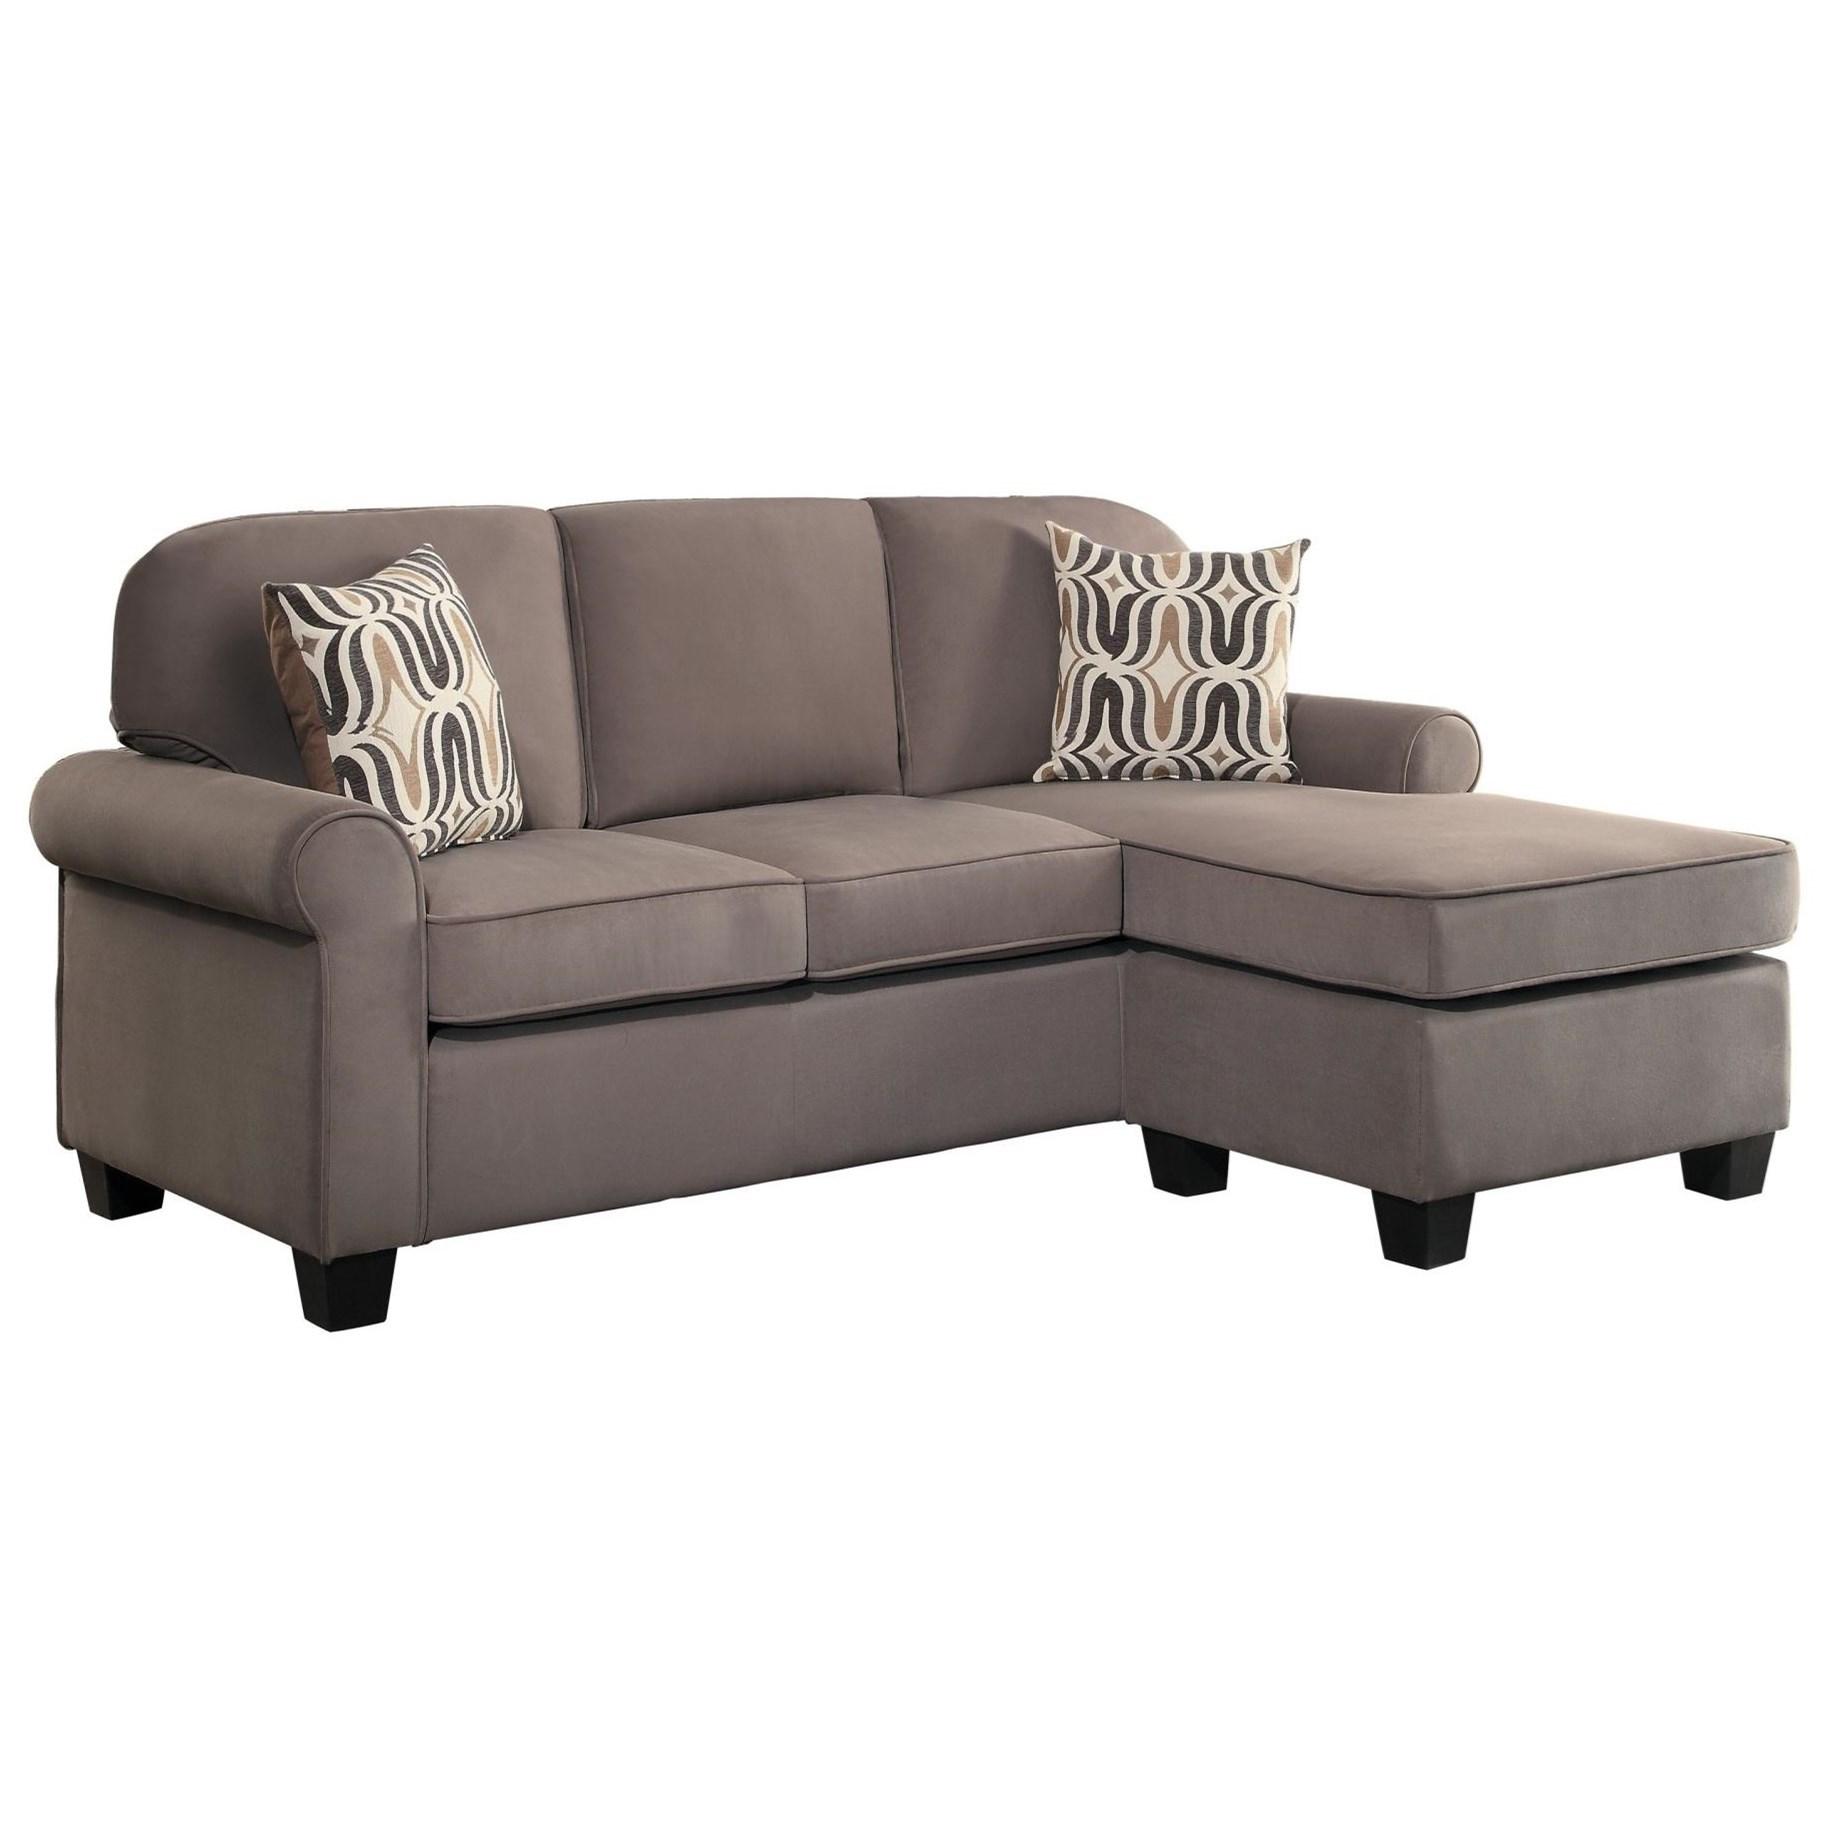 elena reversible chaise sofa cushion alternatives homelegance sprague transitional with